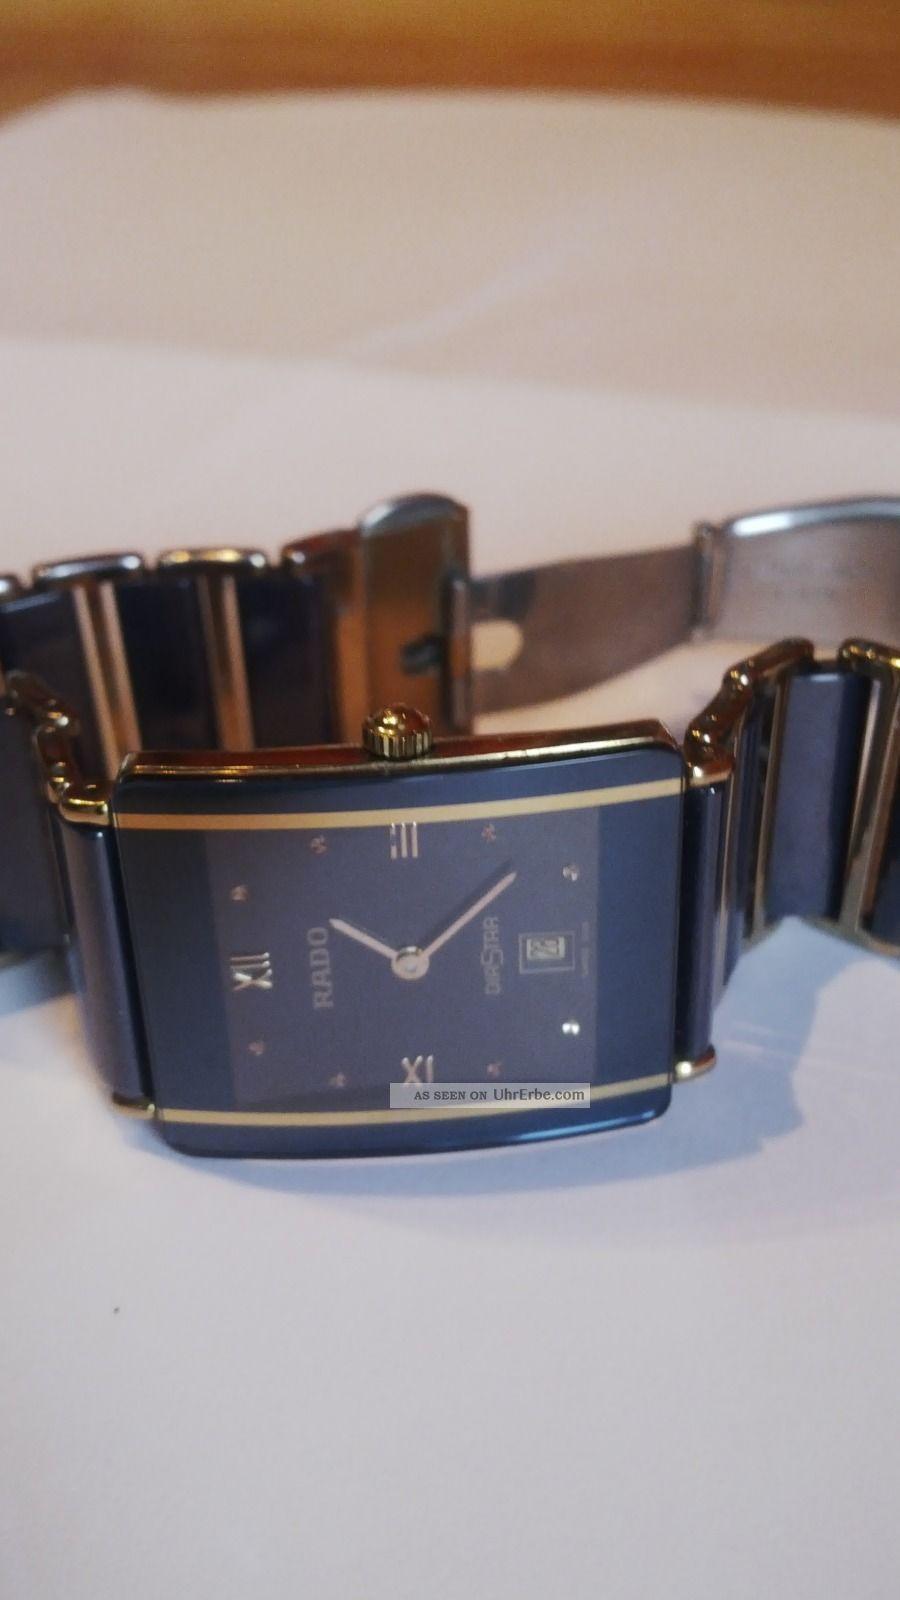 Rado Diastar Unisex Armbanduhr Armbanduhren Bild